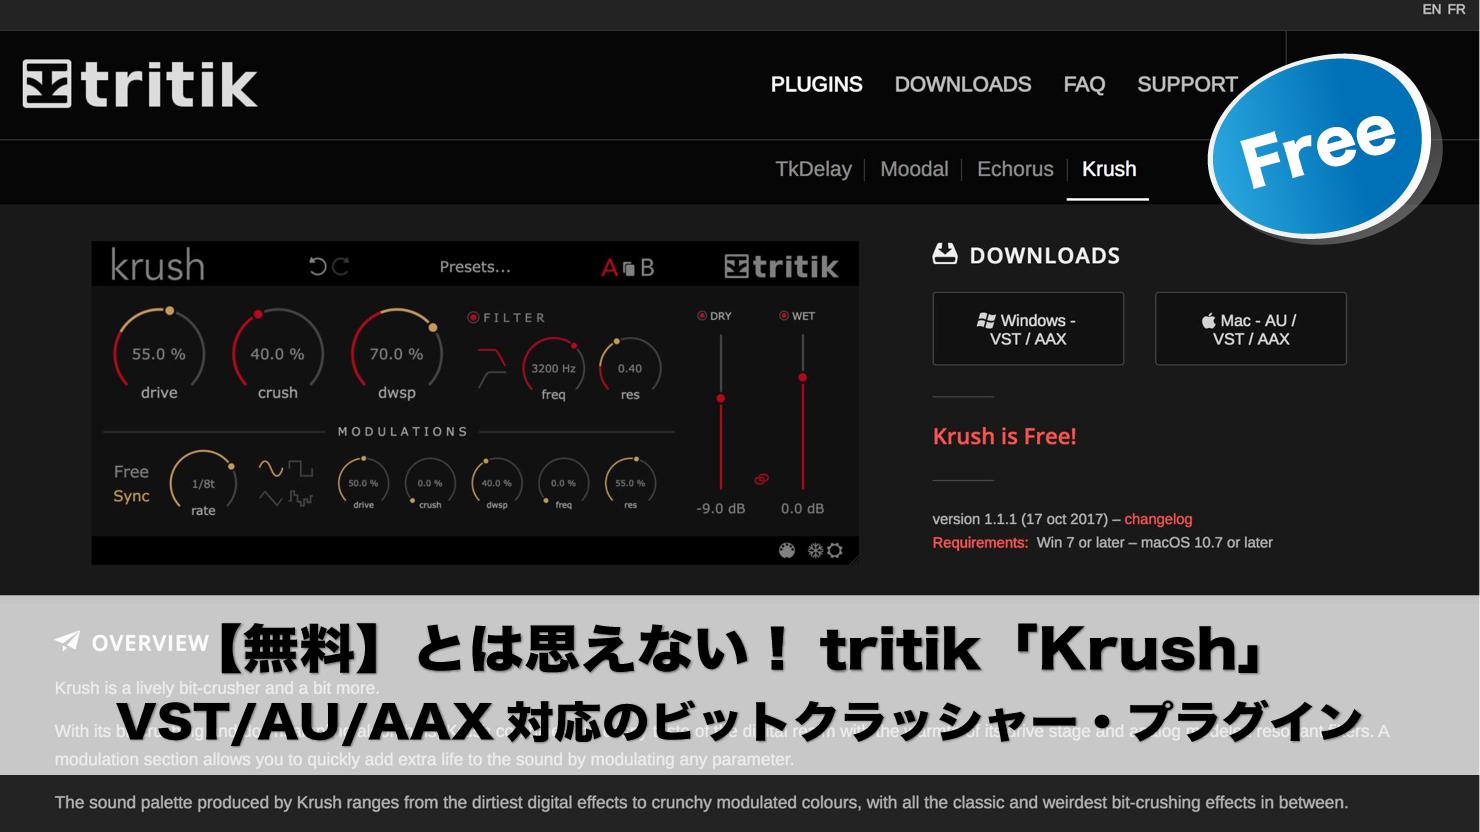 tritik-krush-free-1